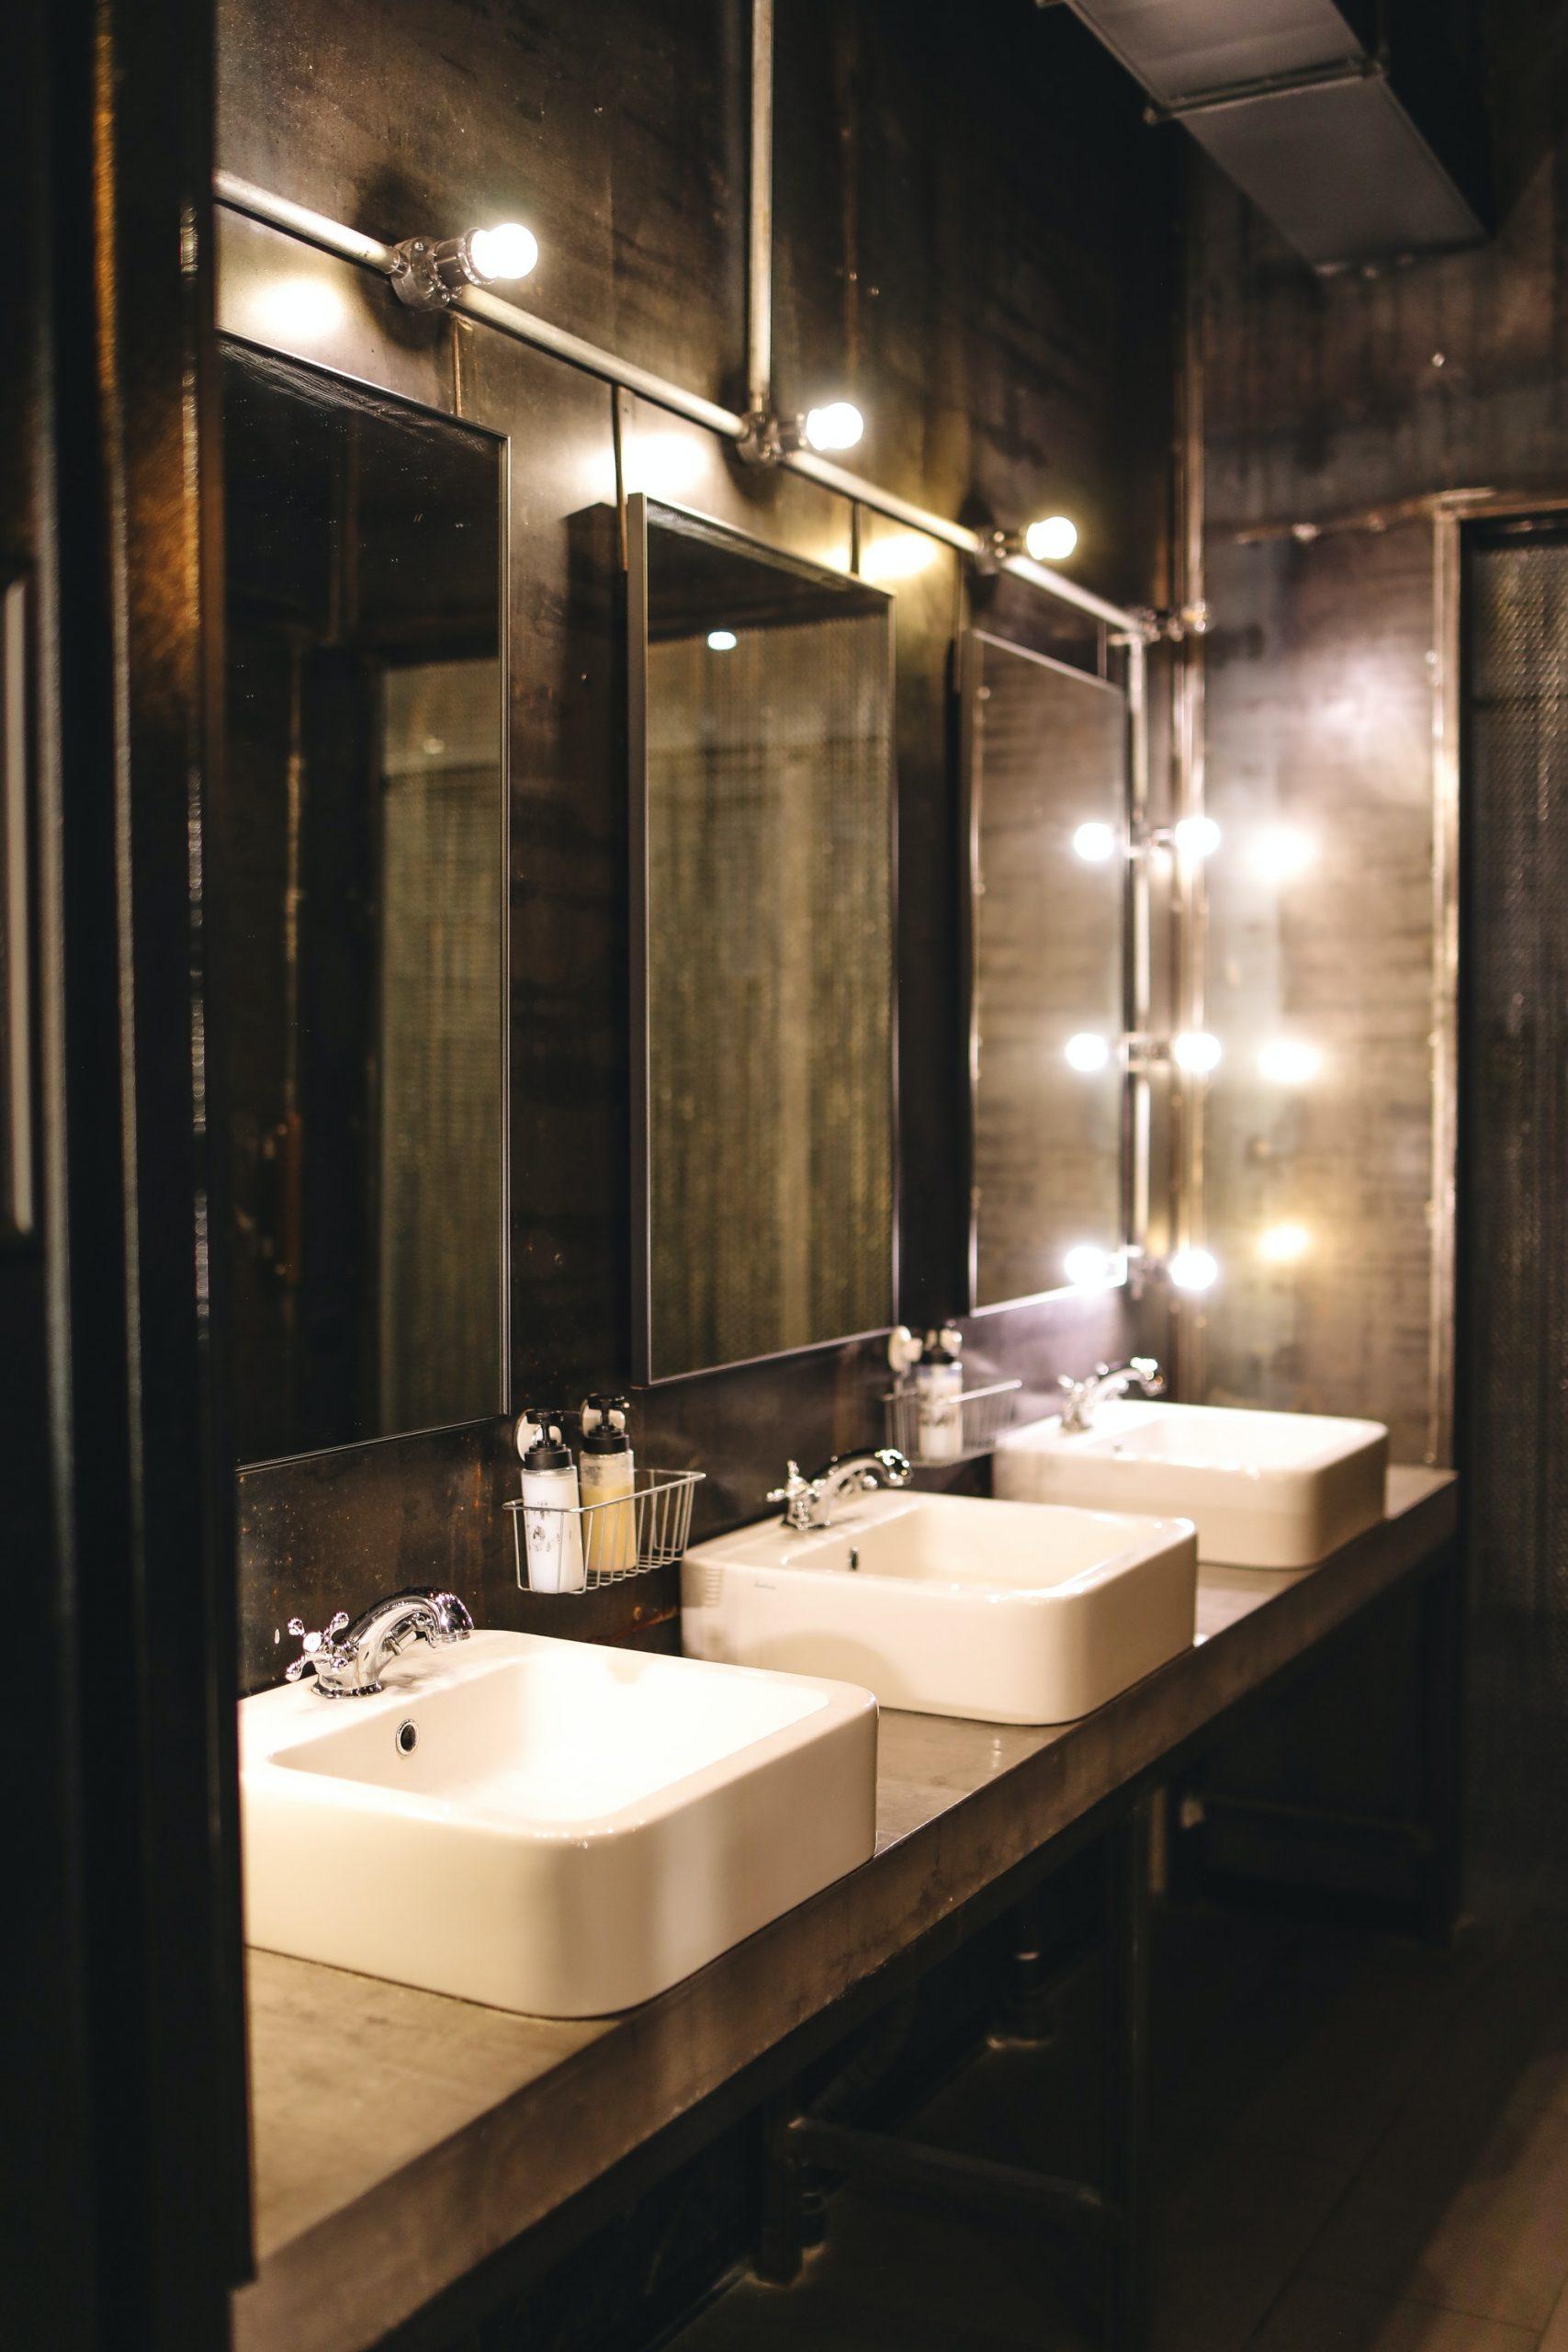 Commercial restroom design construction